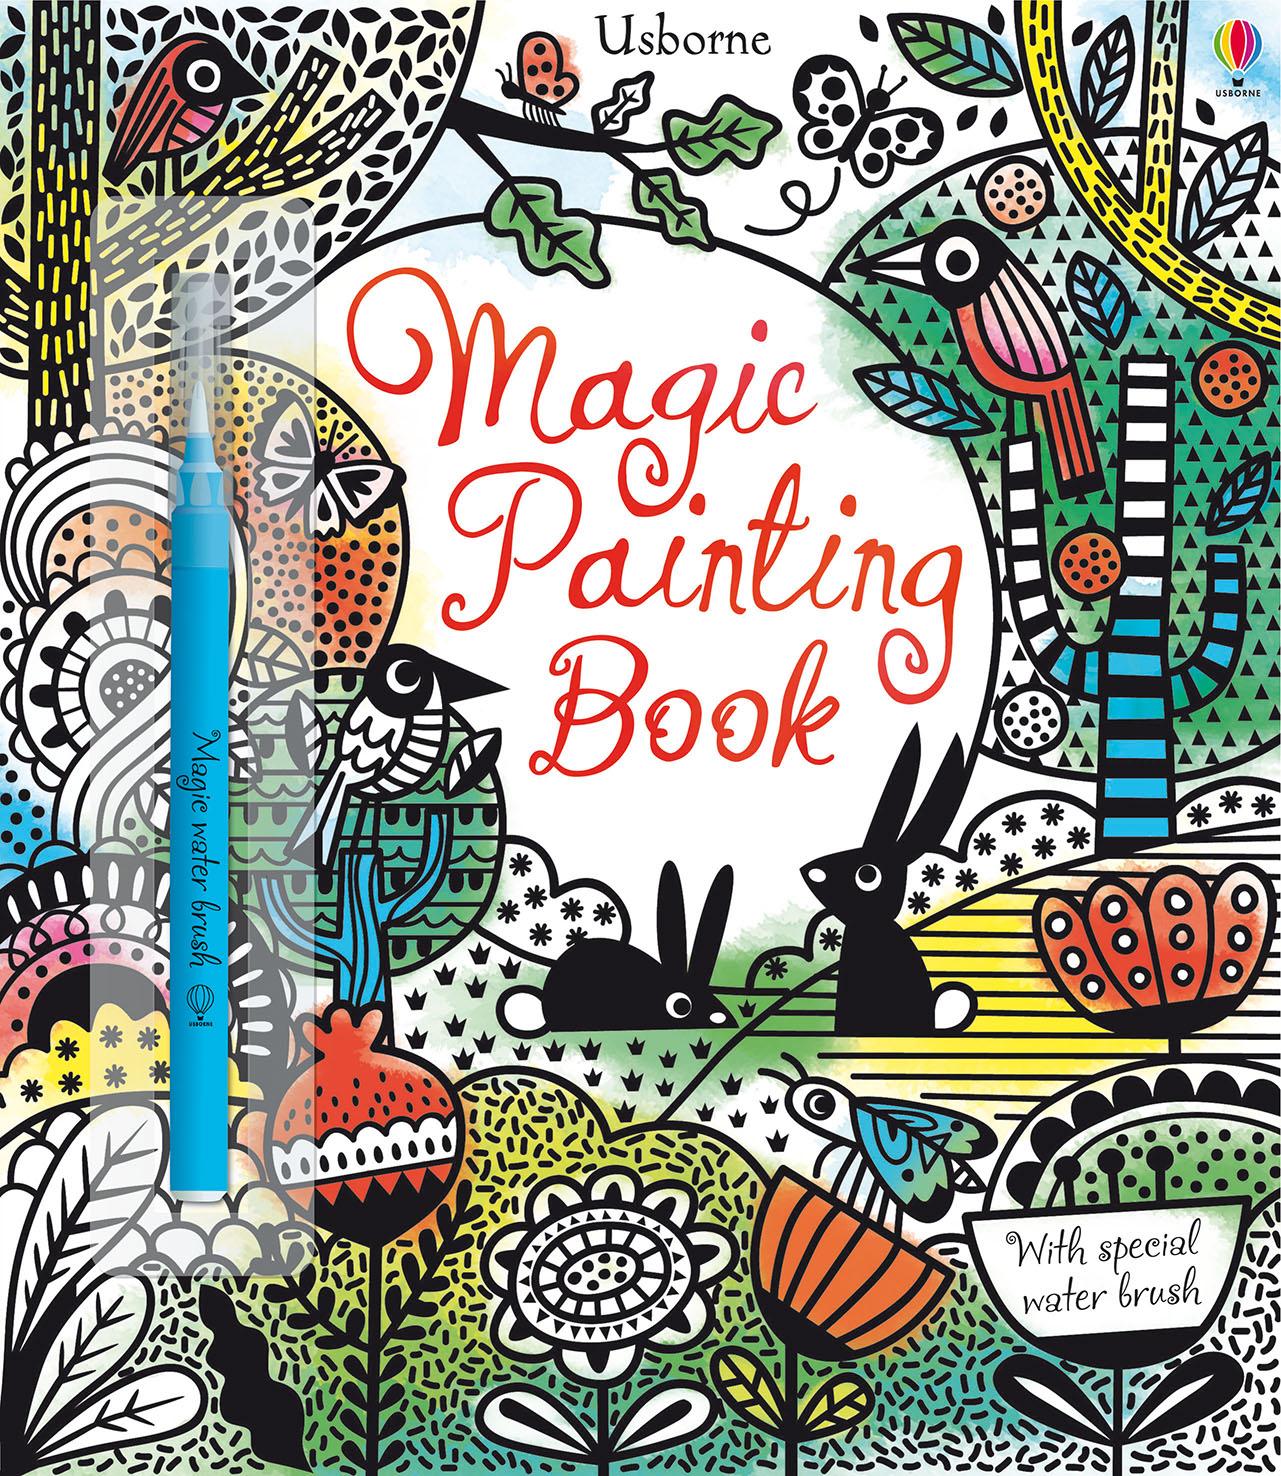 Magic painting book cover.jpg